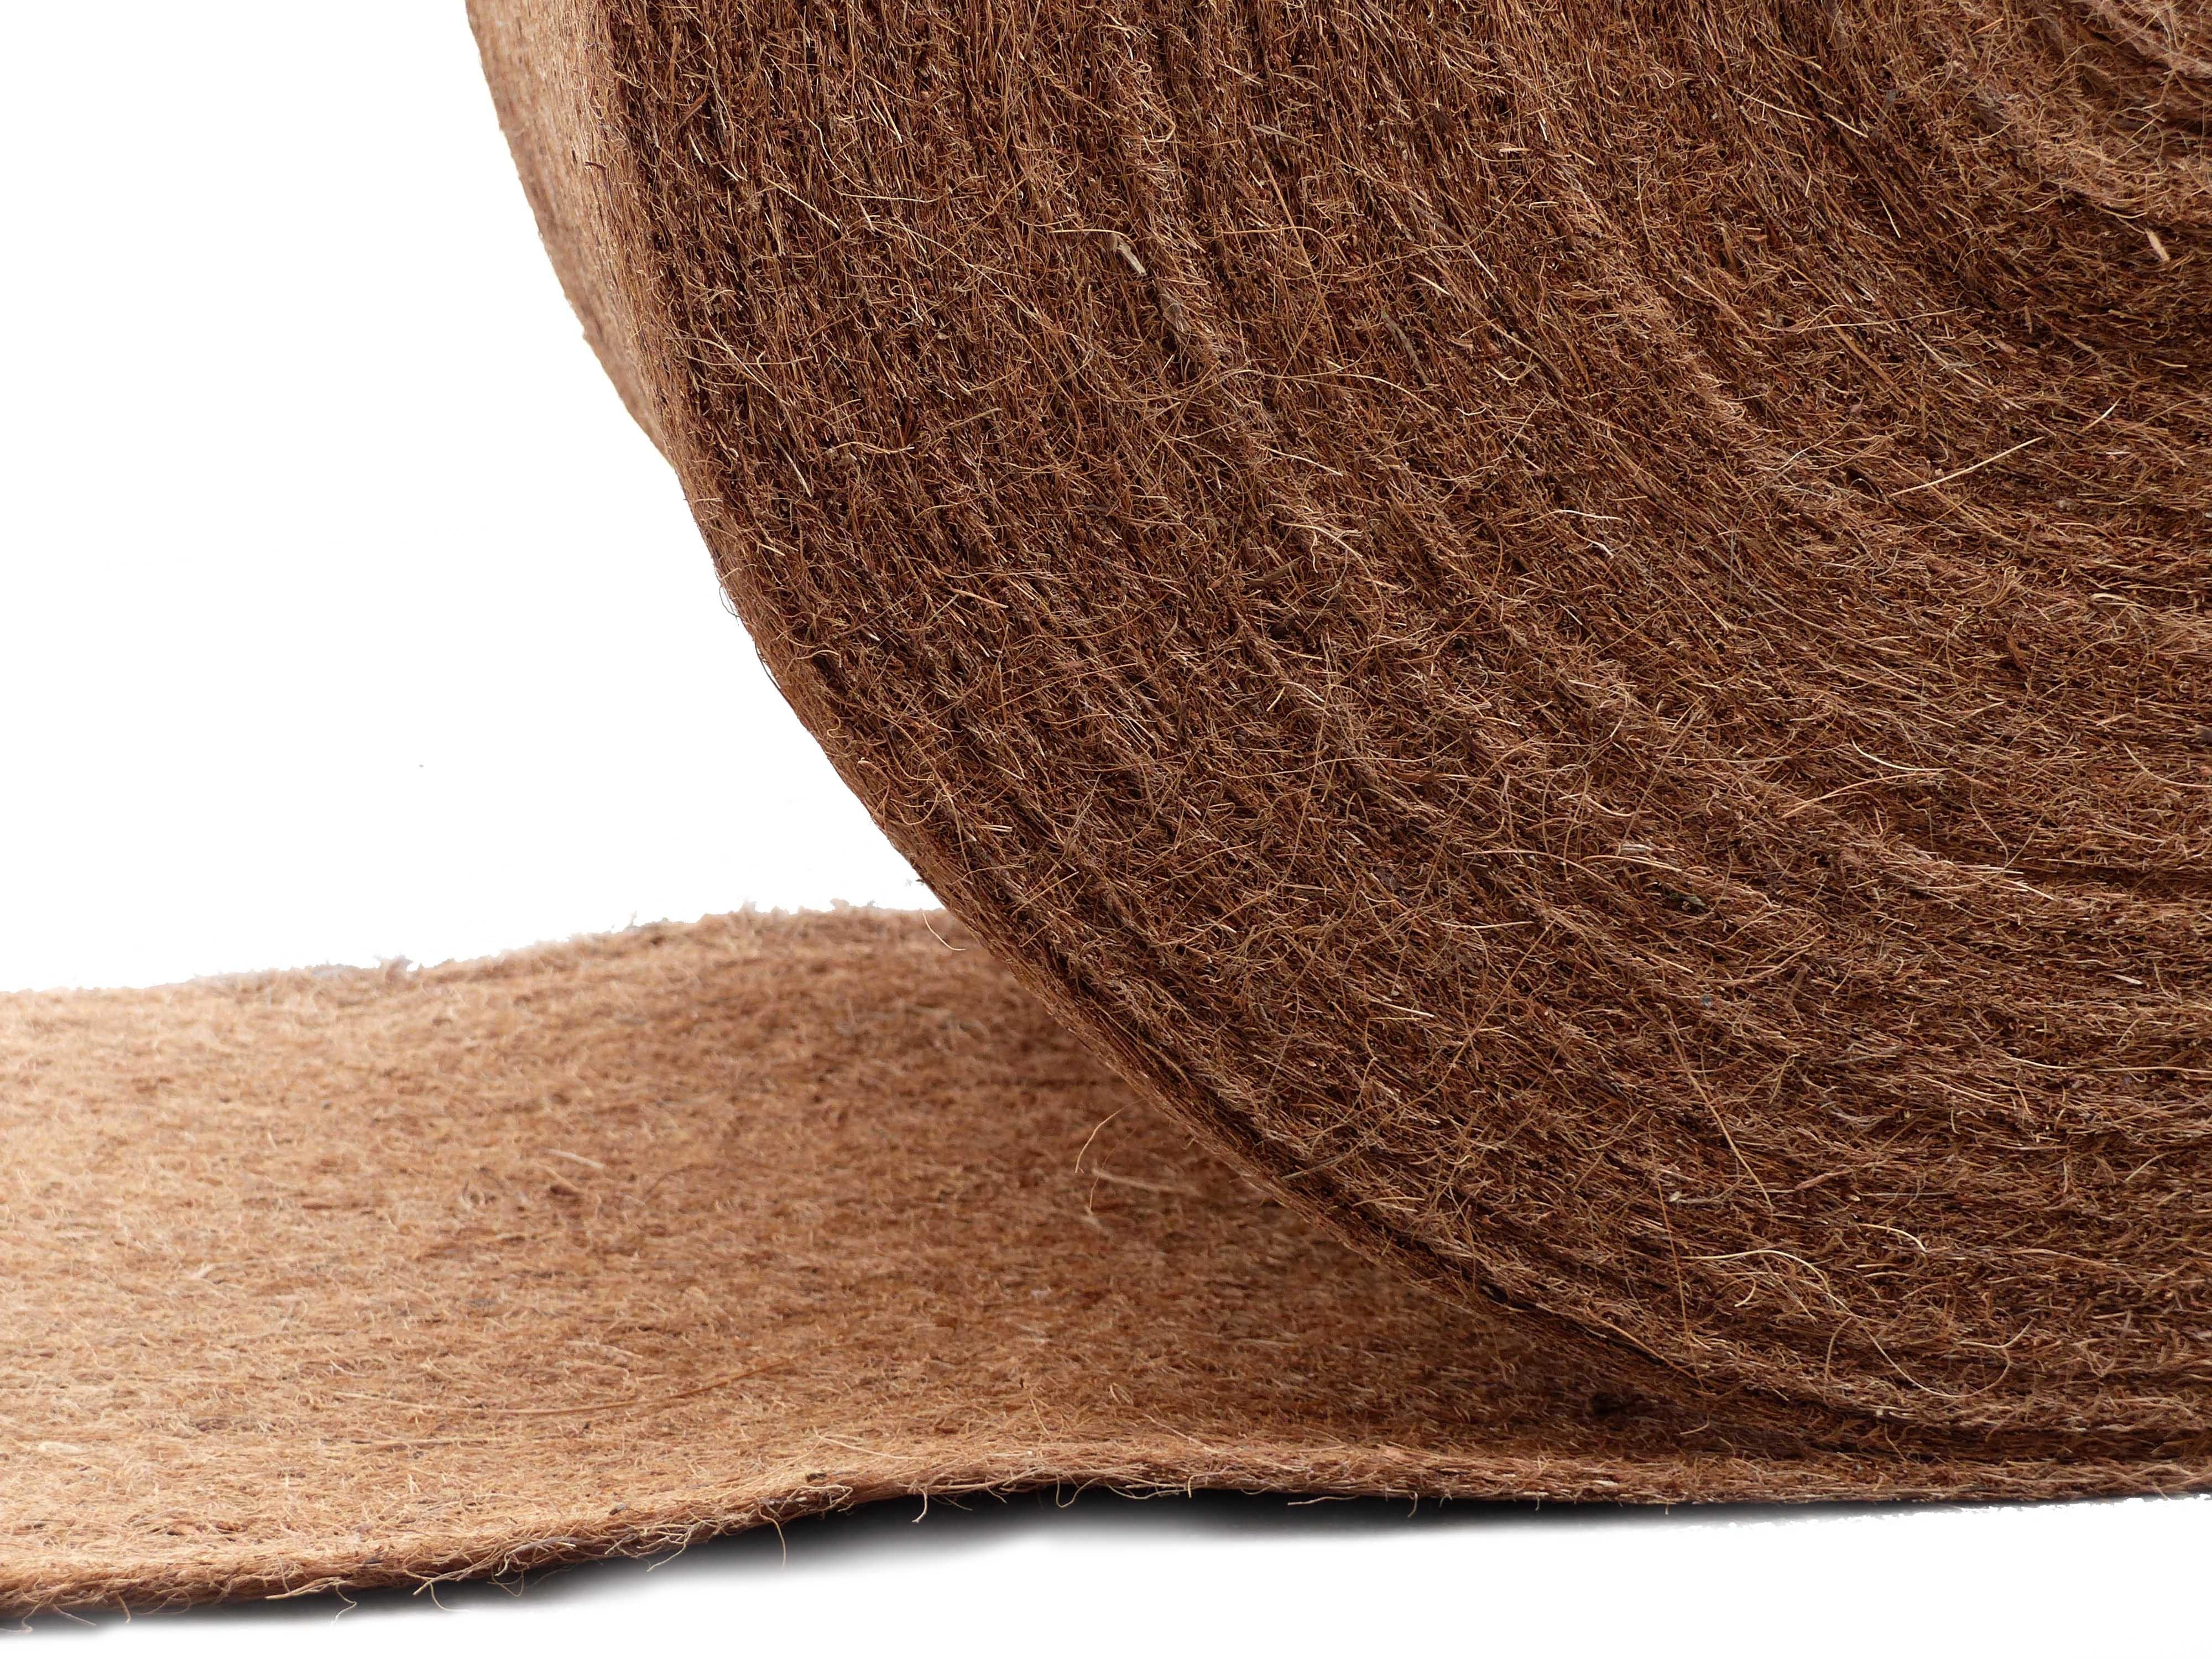 Kokosmatte - Anzuchtvlies - Microgreens 800g/qm - 1